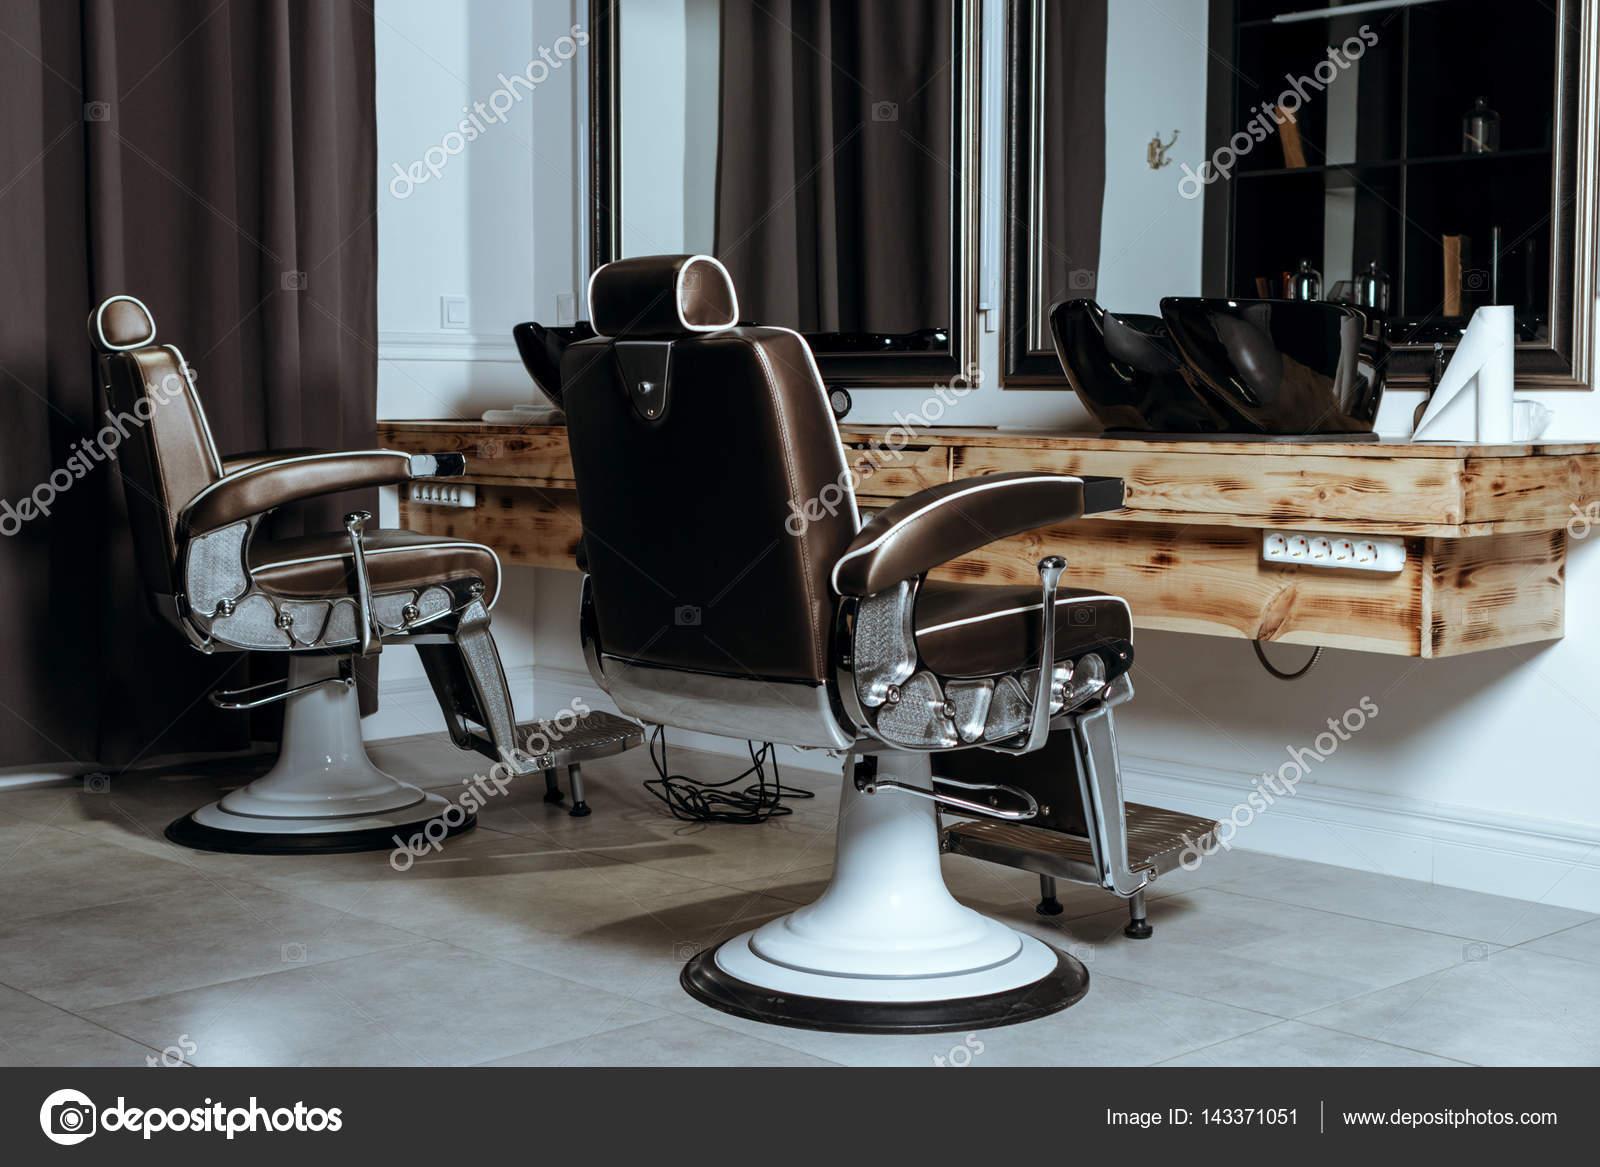 Media poltrona vintage barbiere arredi vintage poltrona barbiere